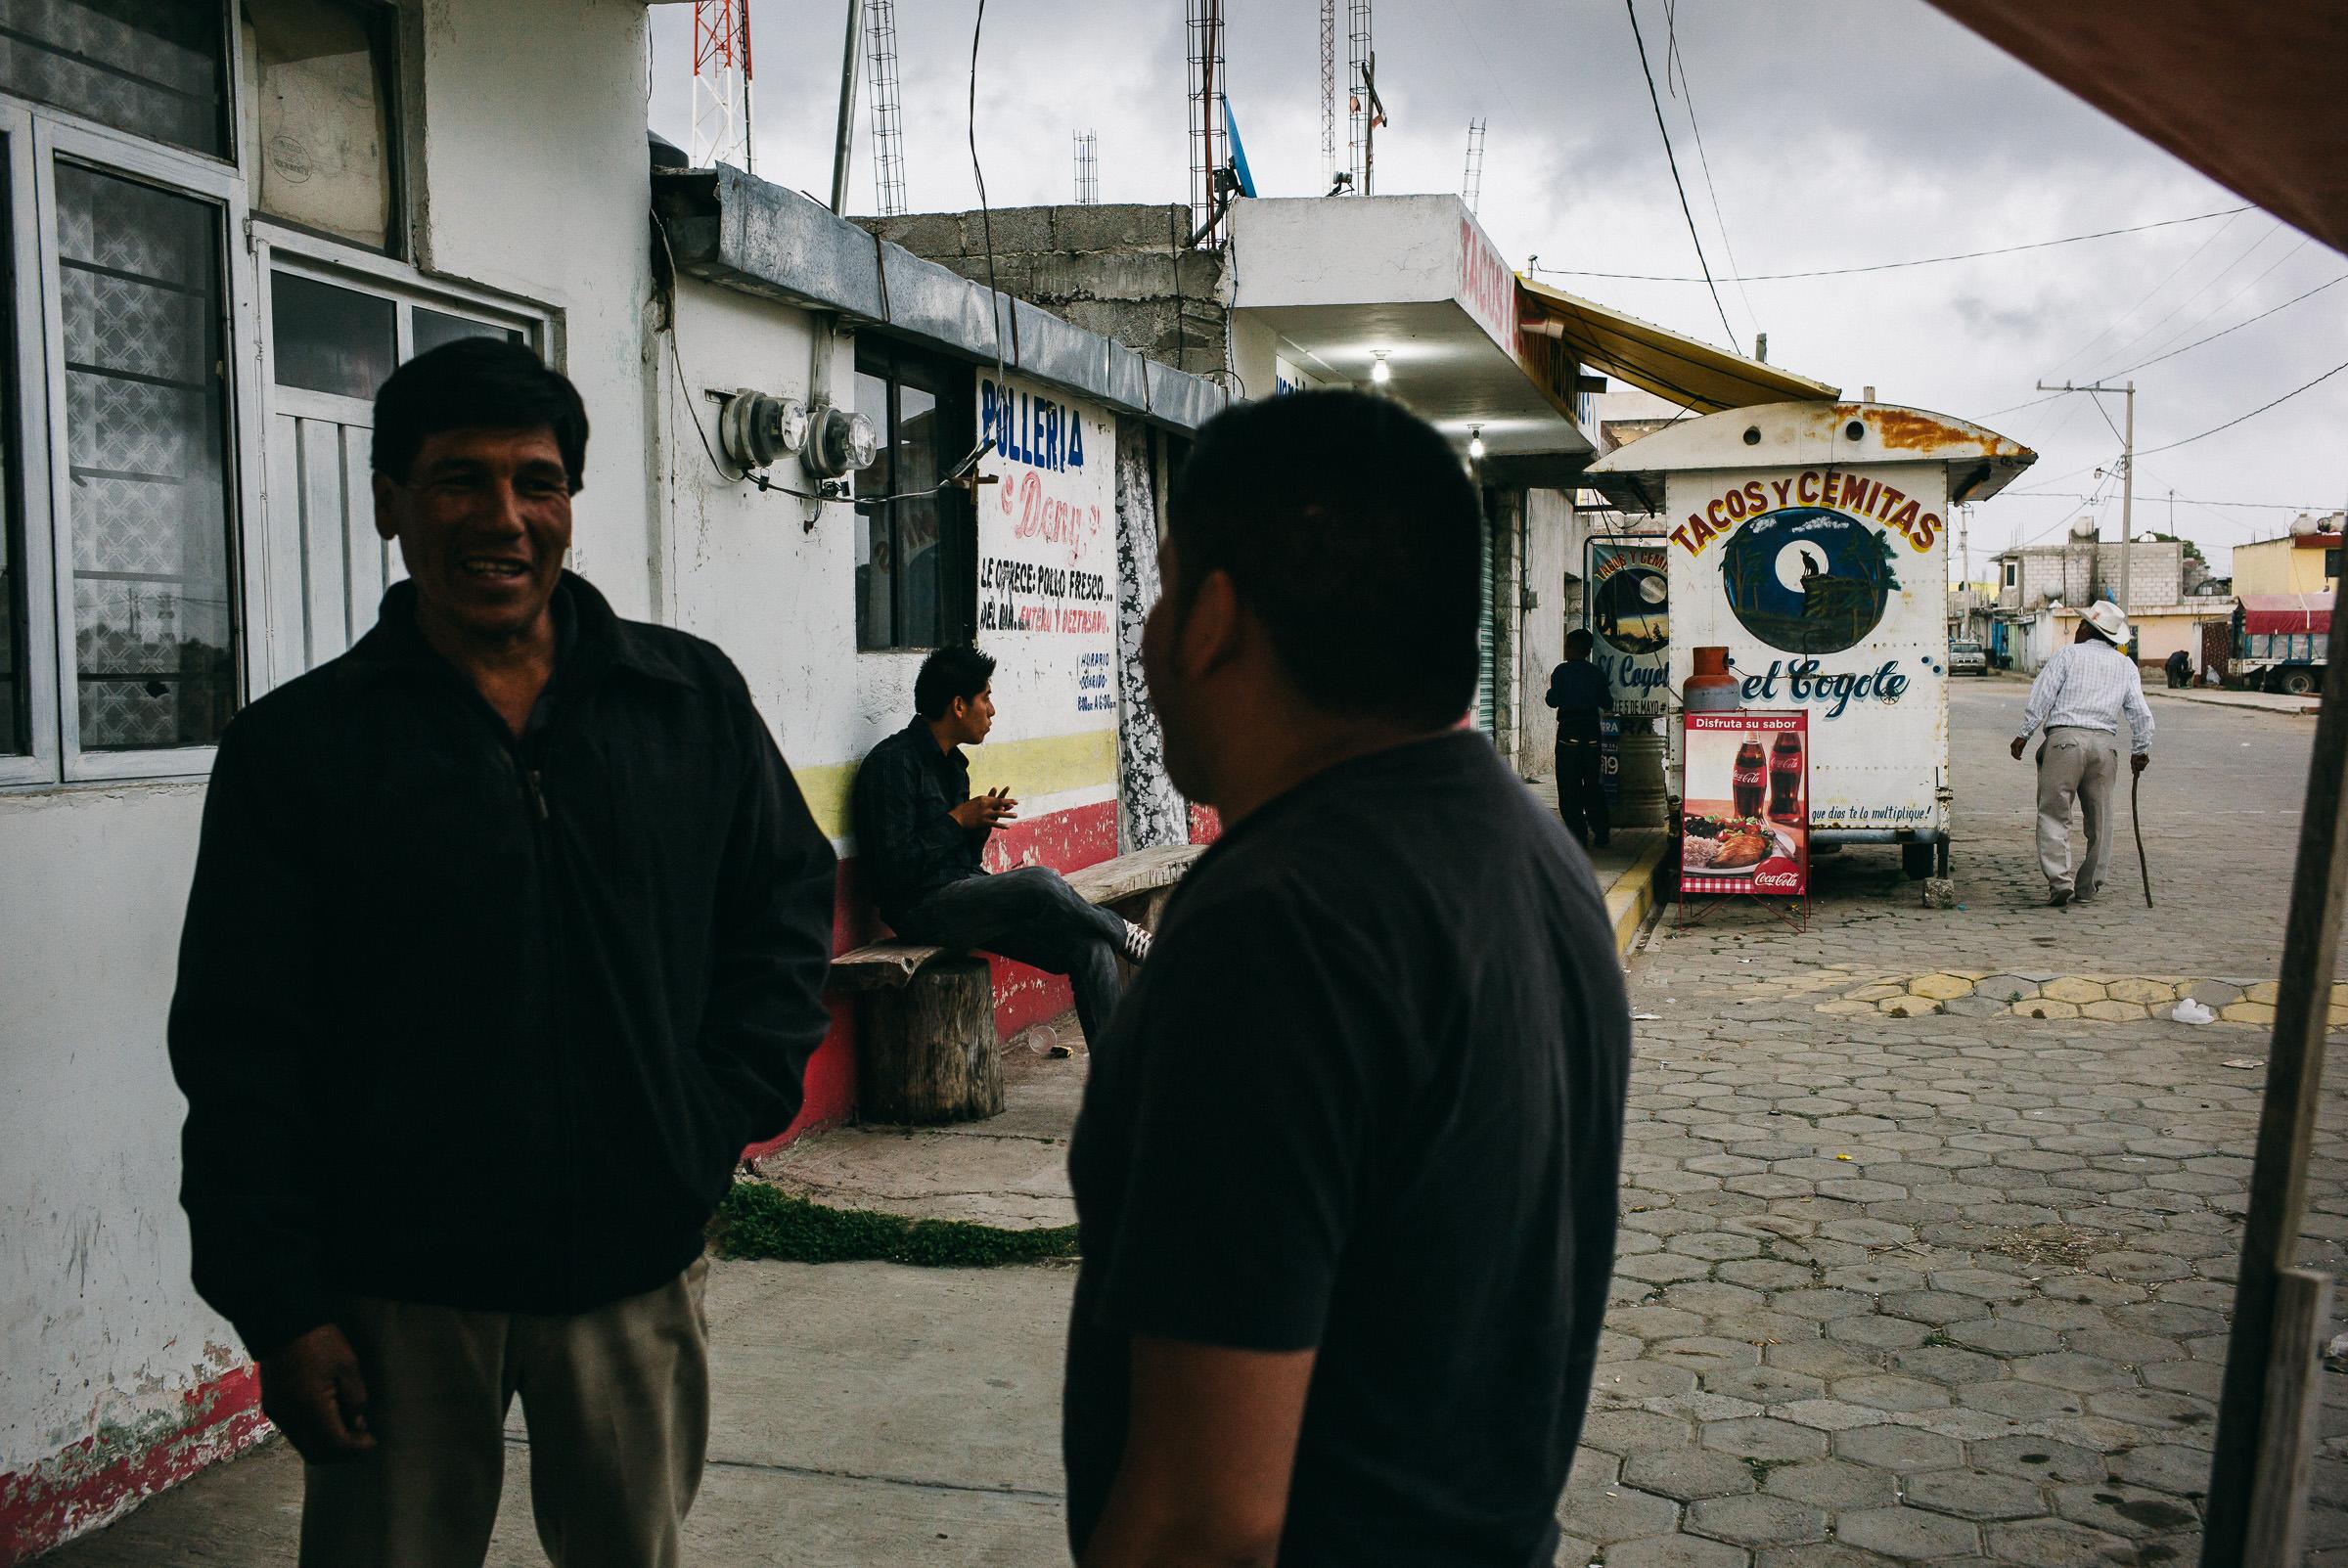 brandon_patoc_travel_photographer_in_mexico_0013.jpg